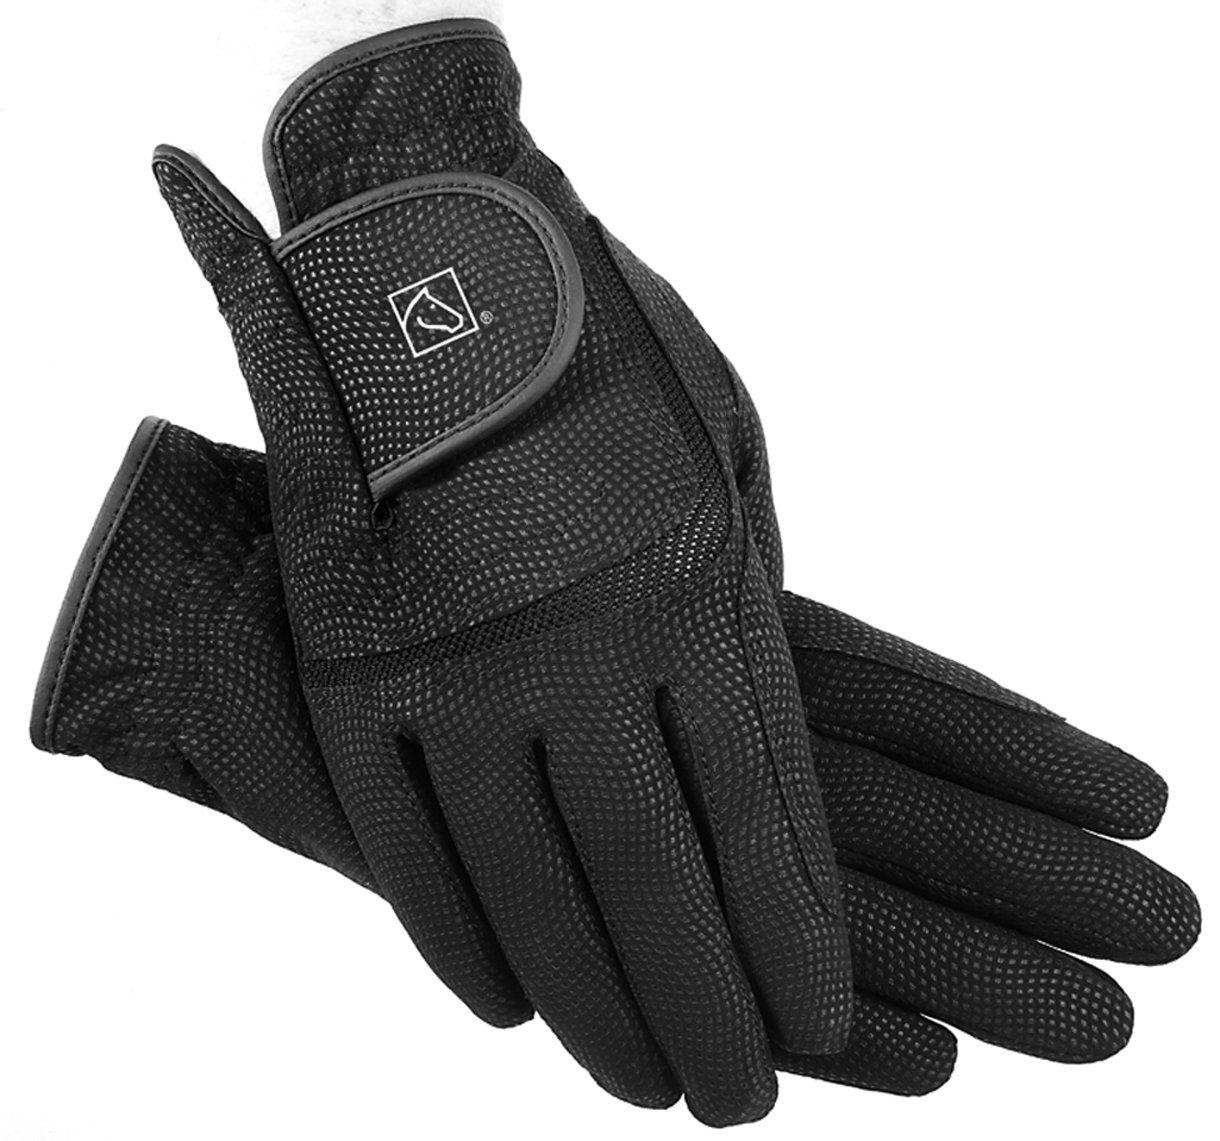 SSG Digital Riding Glove Size 8 SSG Riding Gloves 21006